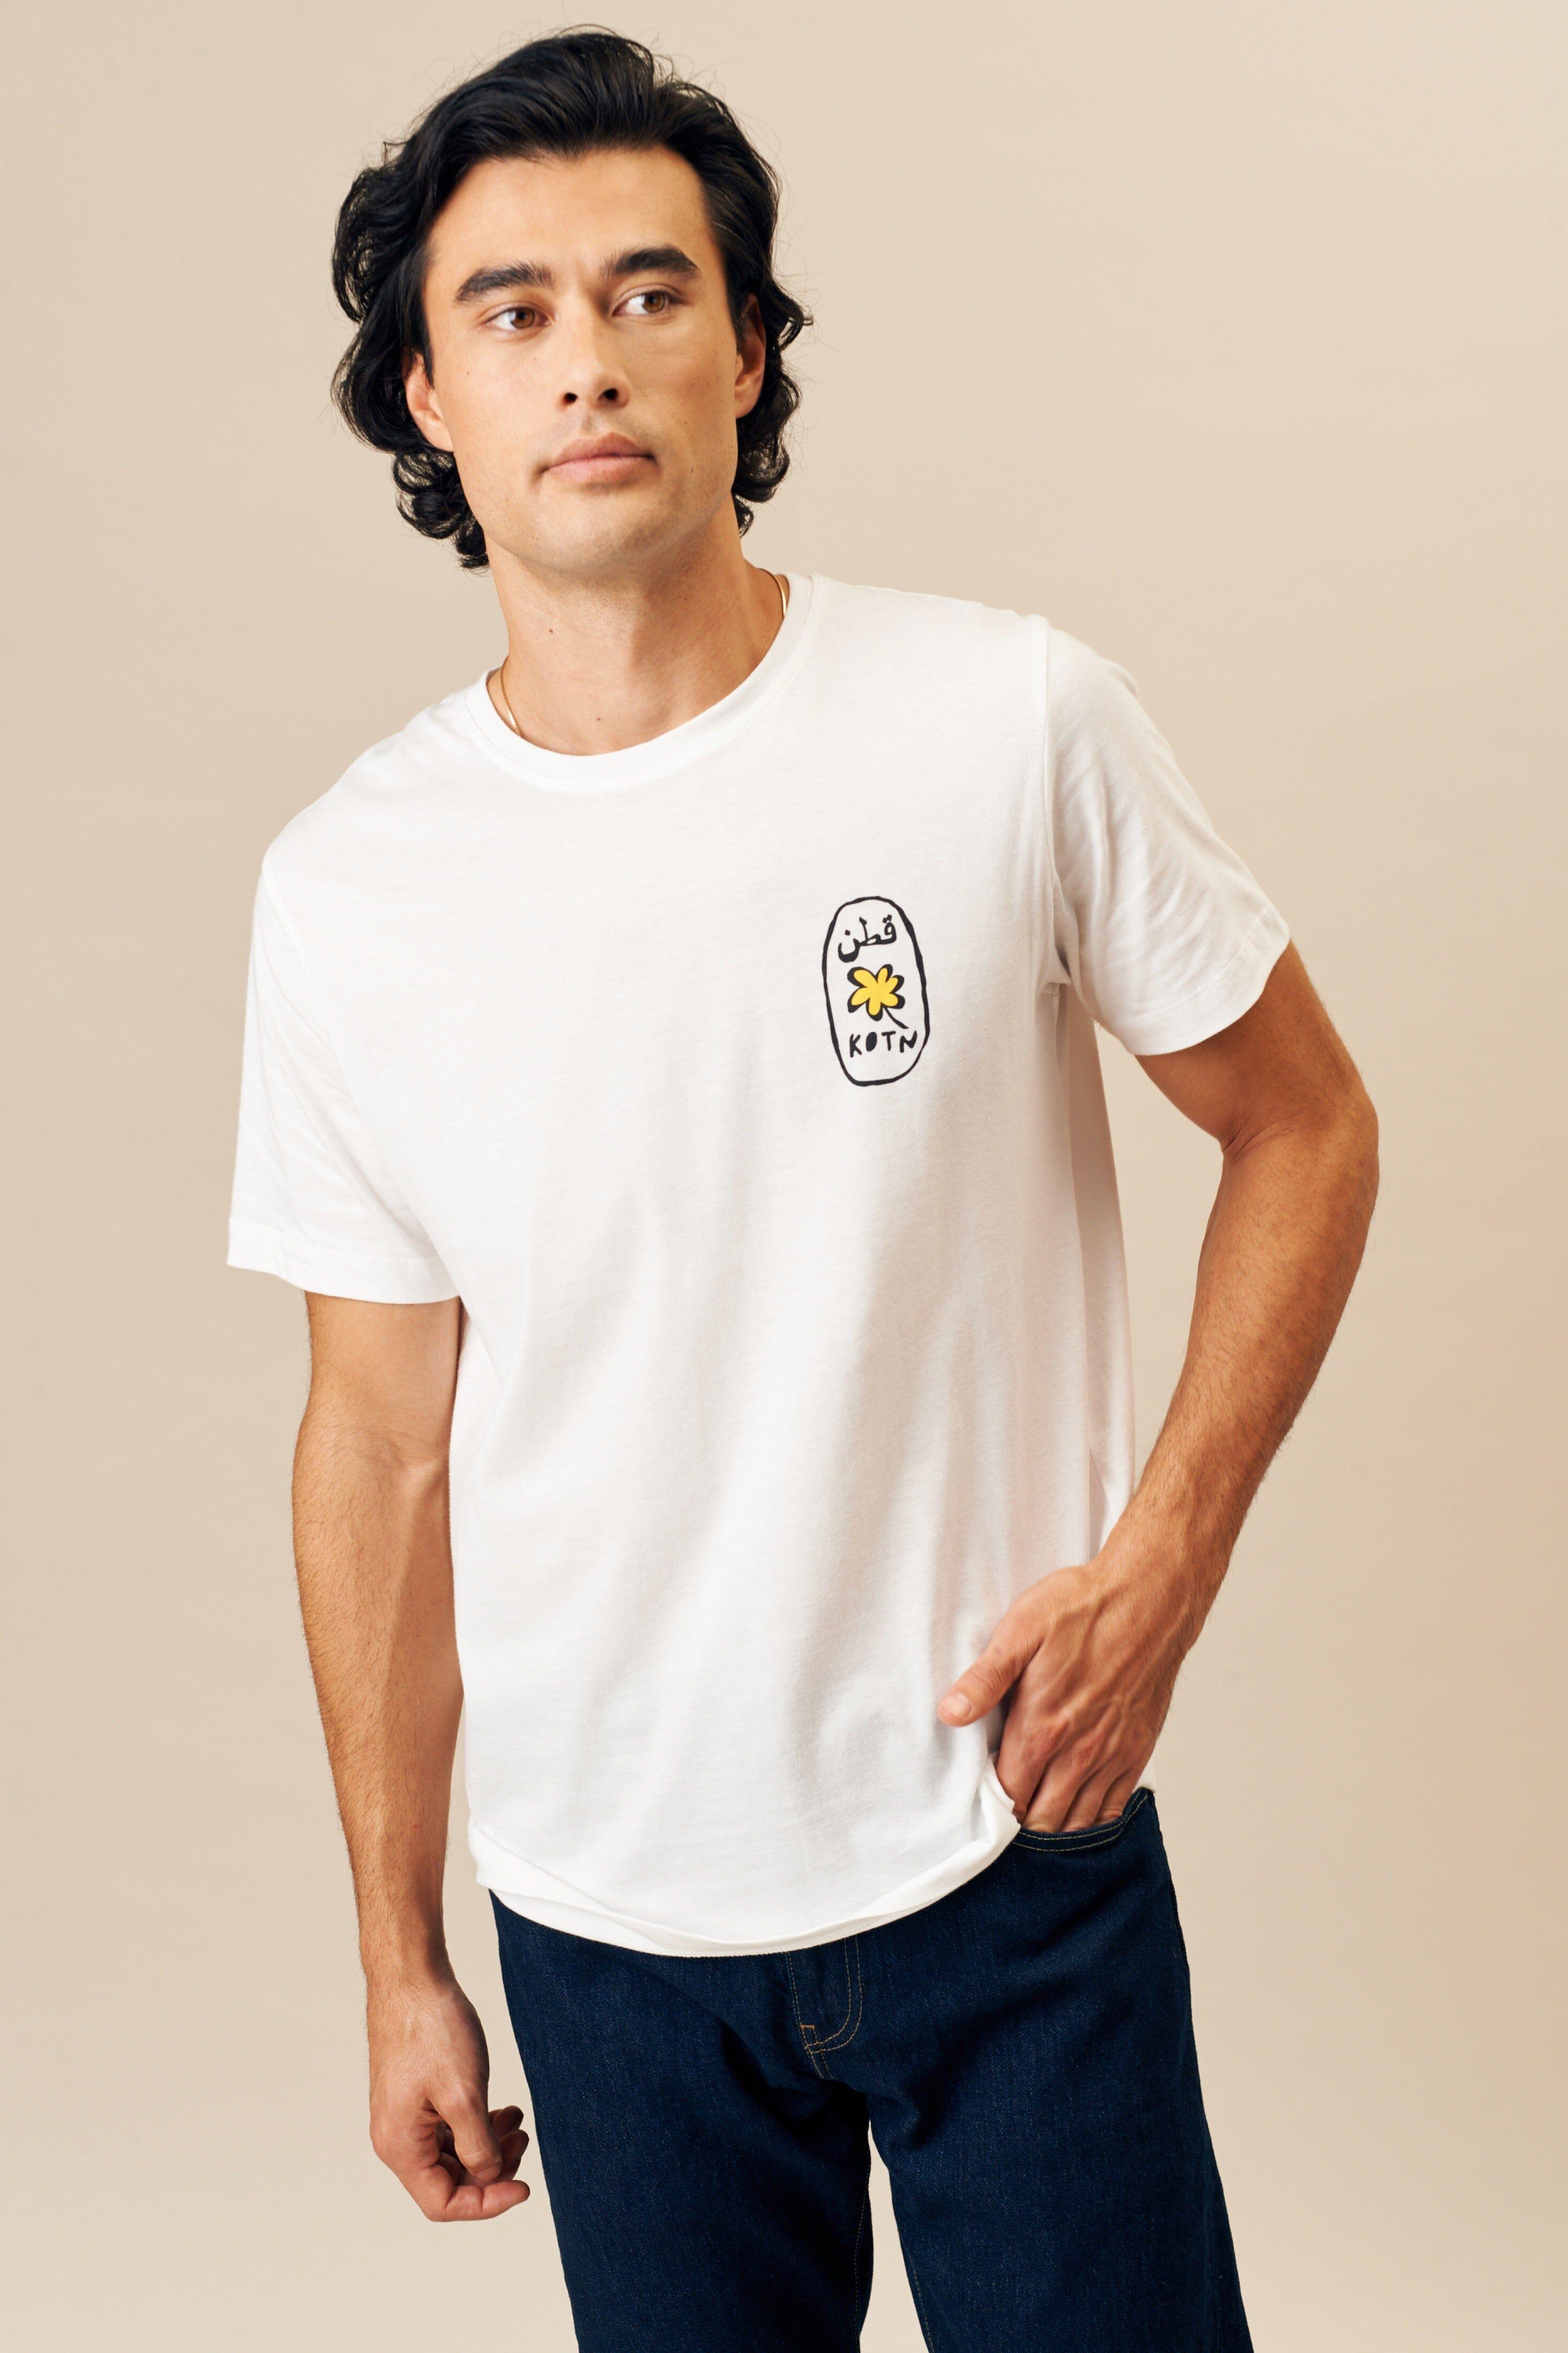 Kotn Unisex Cartouche Crew T-Shirt in White, Size Small, 100% Egyptian Cotton